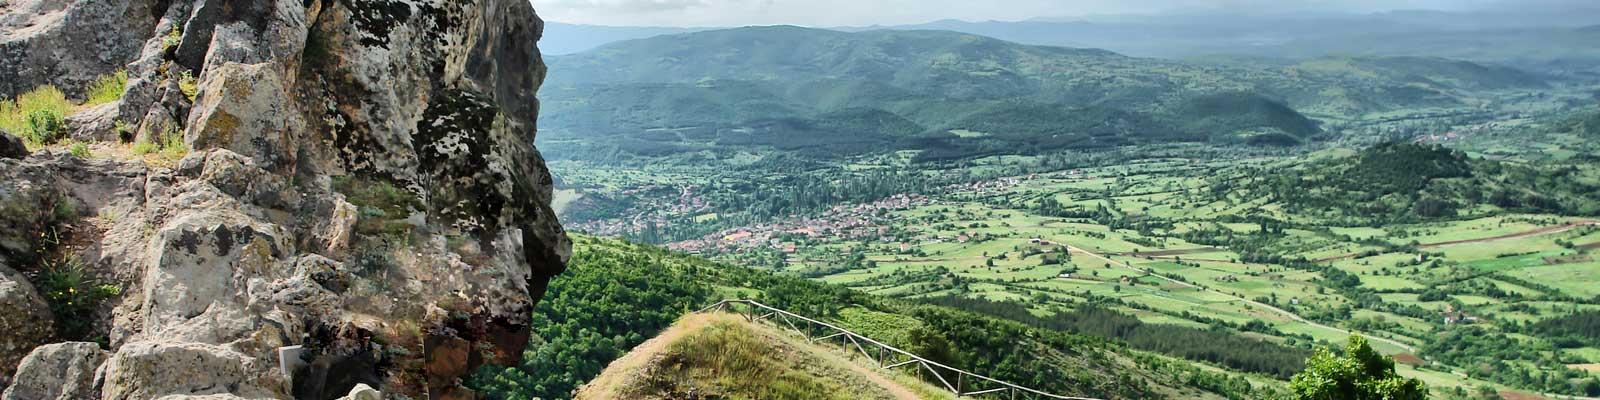 Panama Montanhas Verdes  Residencial, Comercial, Terrenos. A venda, ou para Alugar.